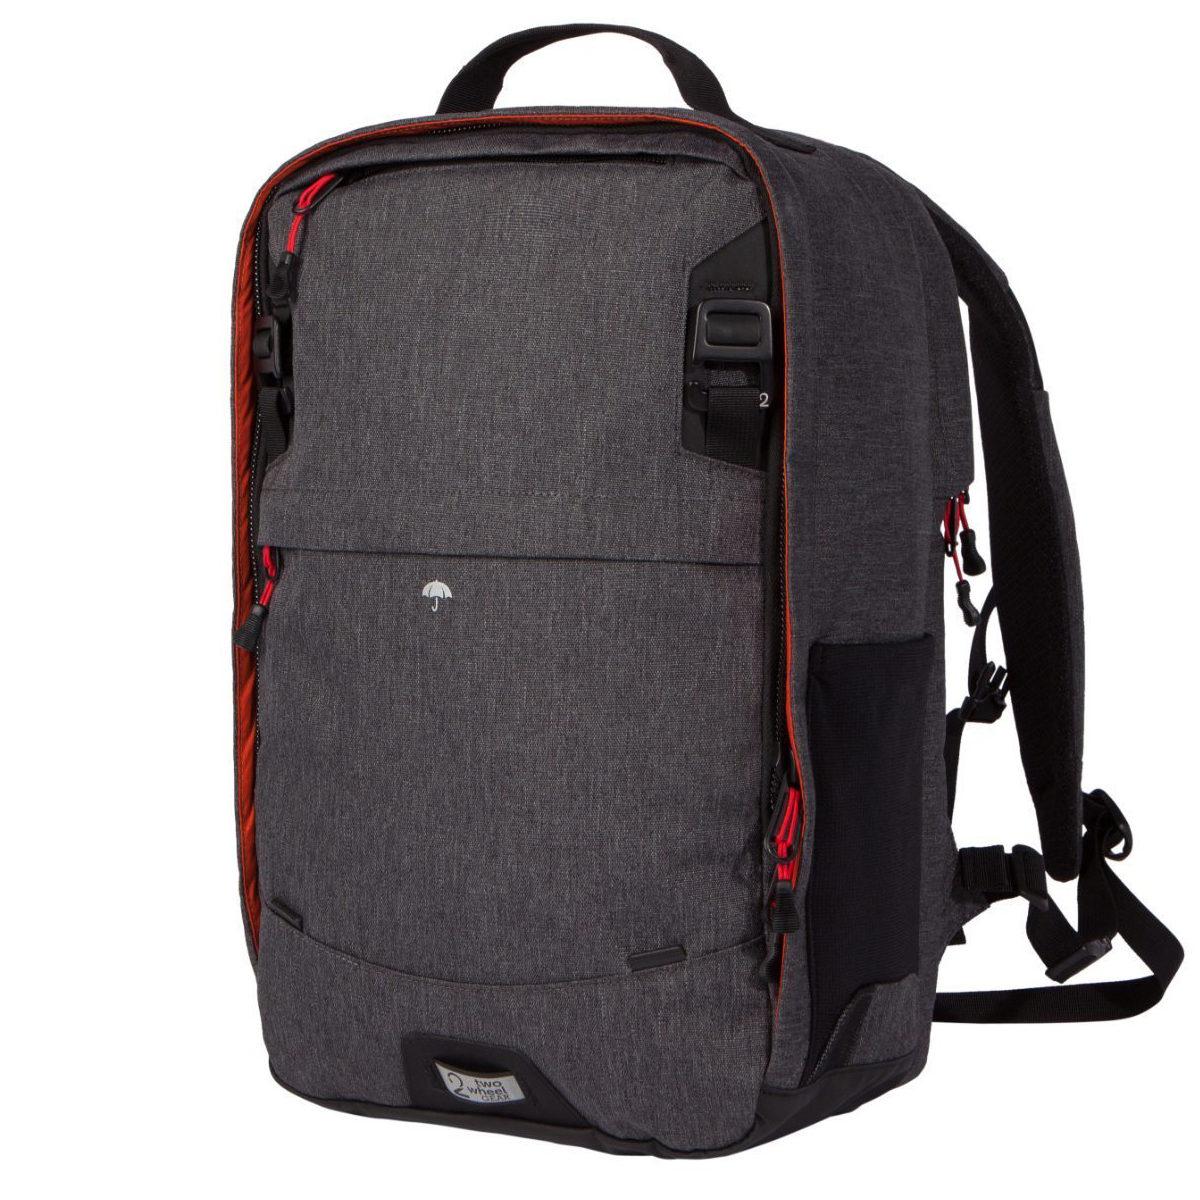 Pannier Backpack Convertible – Lite 1